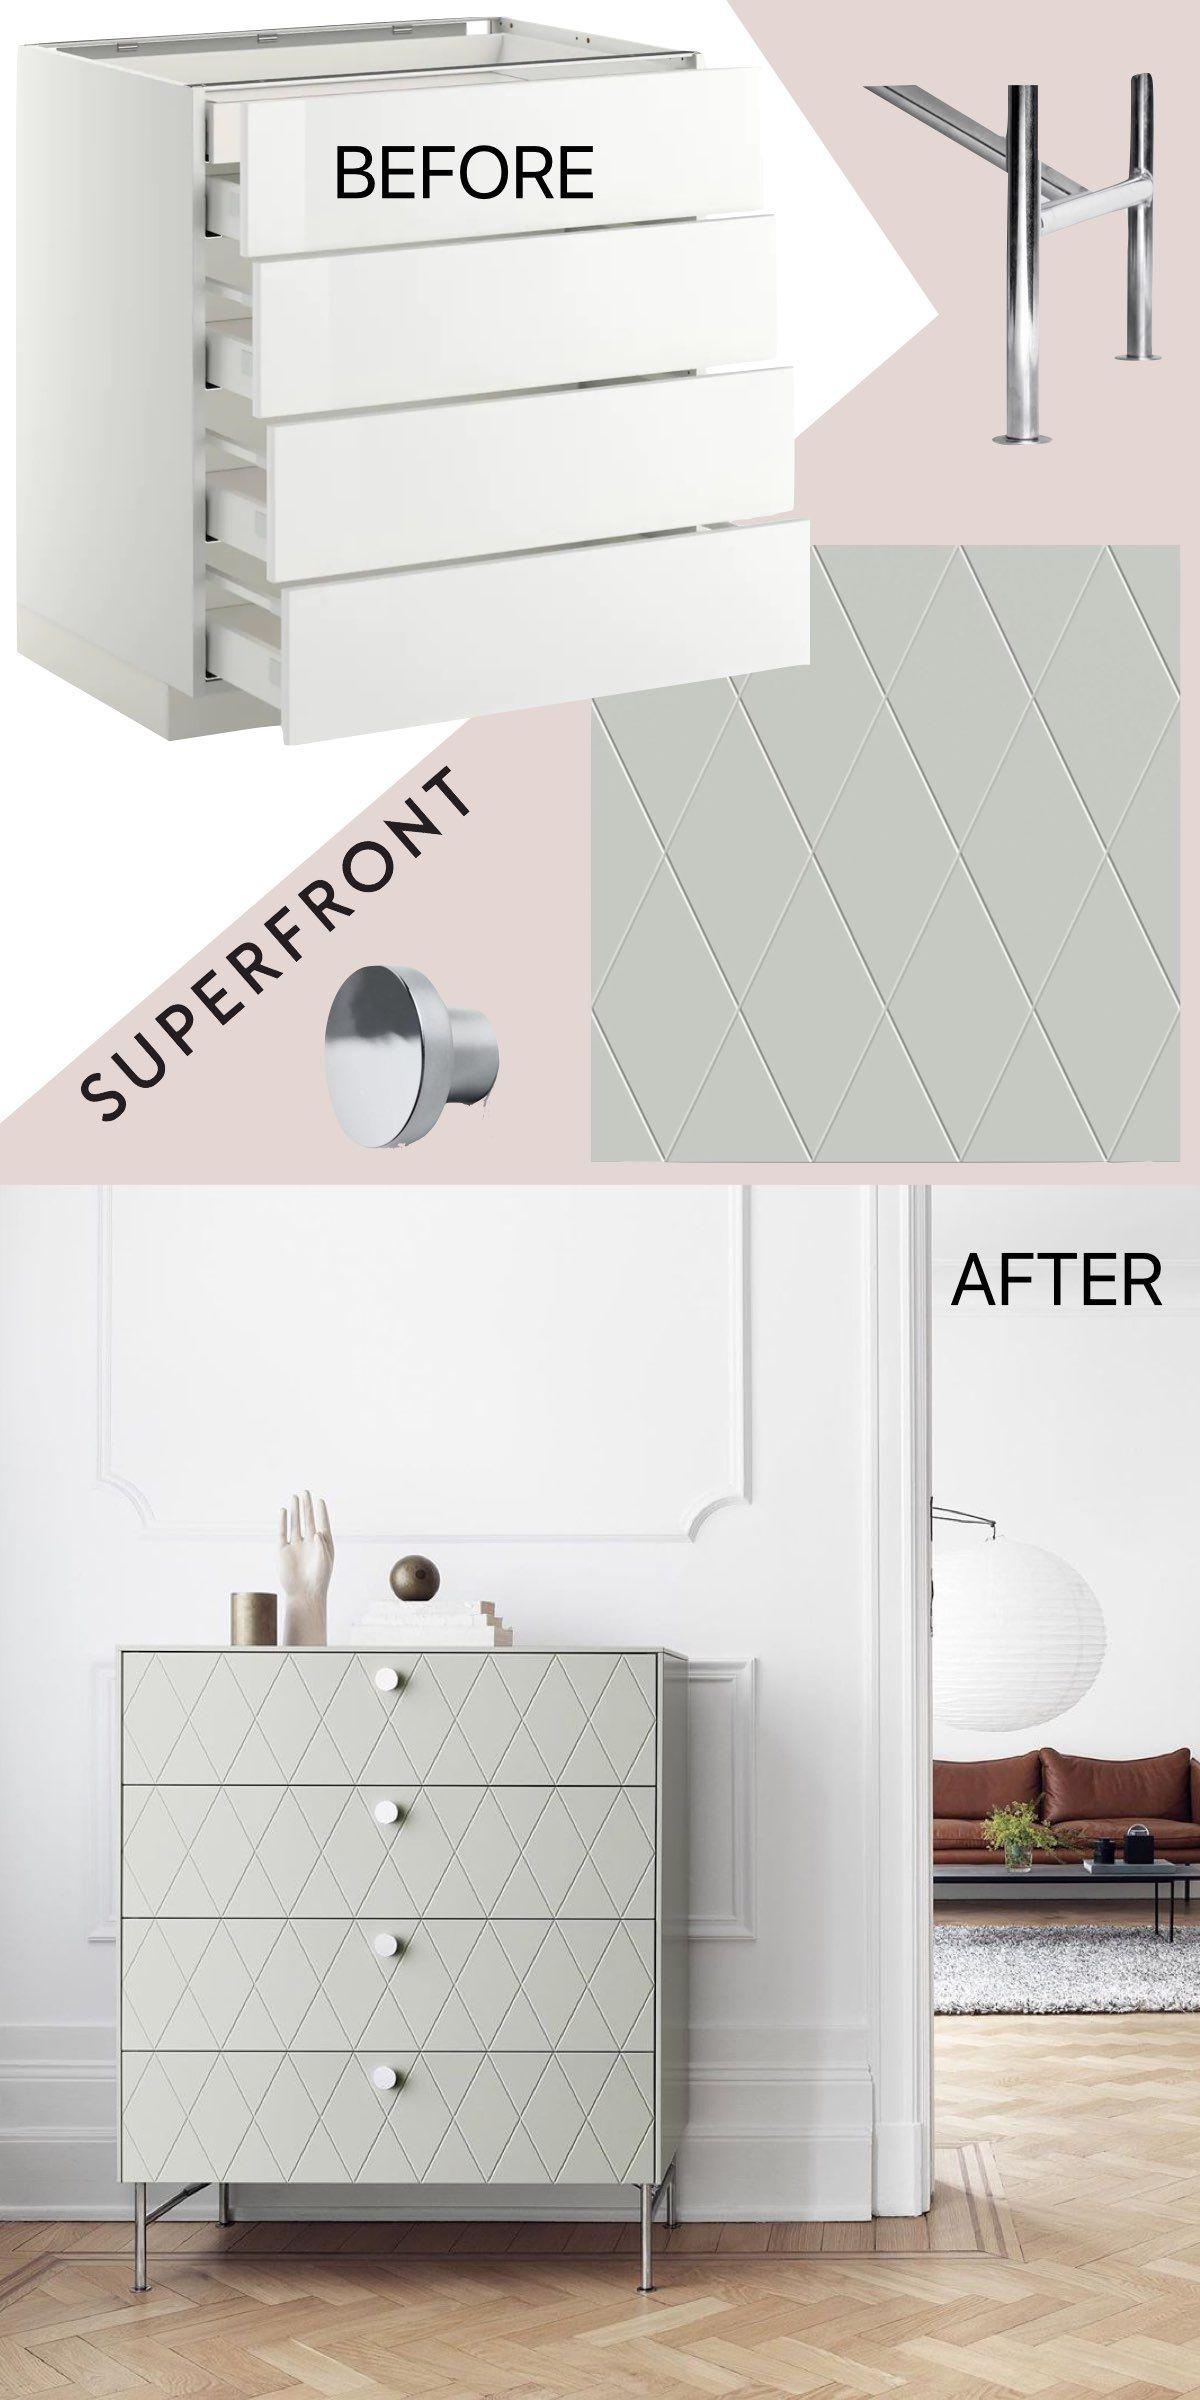 Superfront Avis Pour Transformer Cuisine Ikea Clem Around The Corner En 2020 Meuble De Cuisine Ikea Avant Apres Meubles Ikea